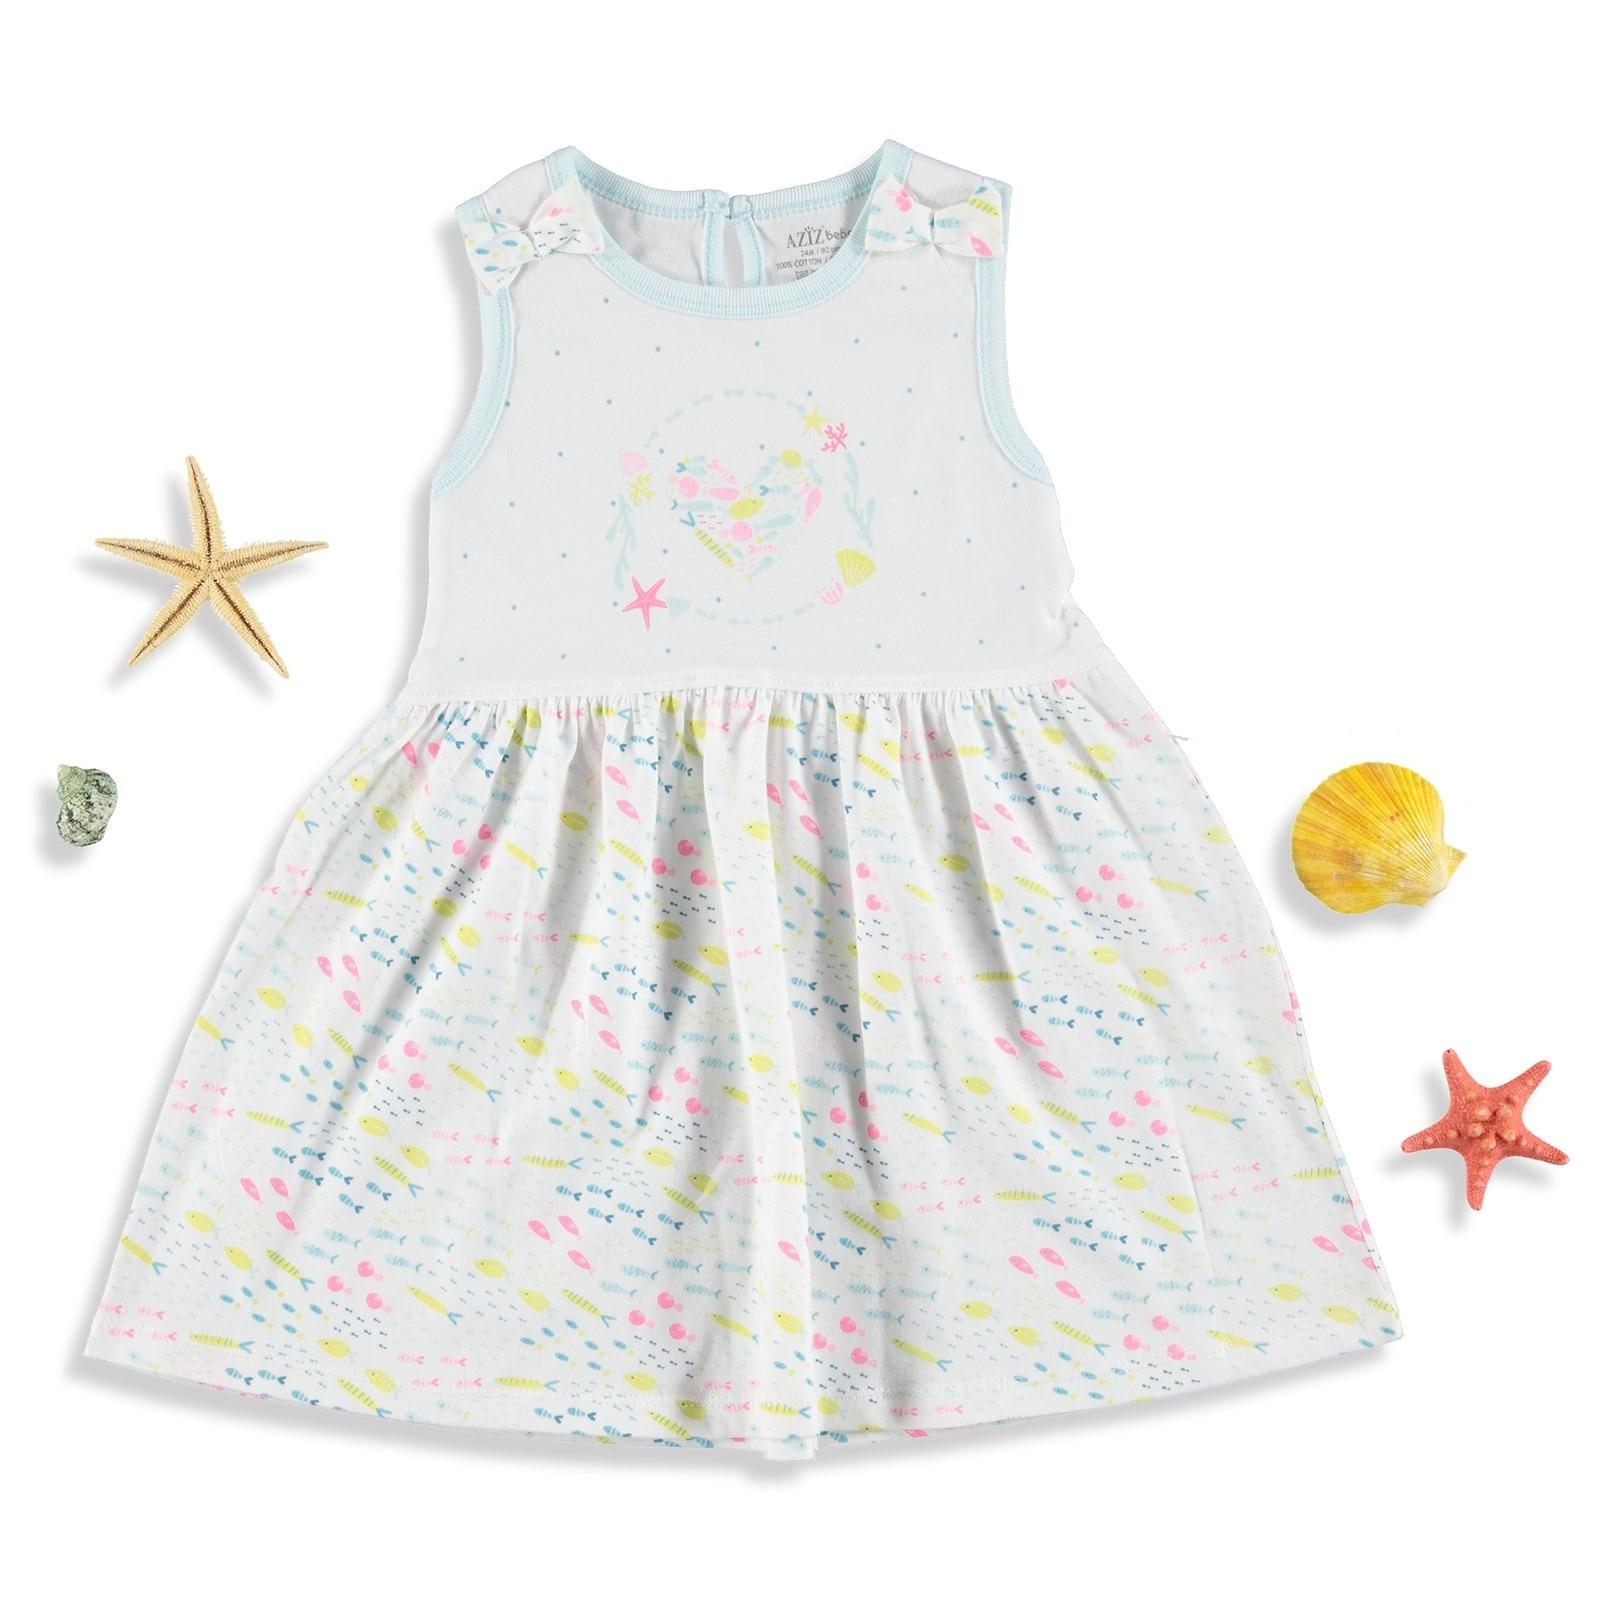 Ebebek Aziz Bebe Strawberry Baby Girl Dress